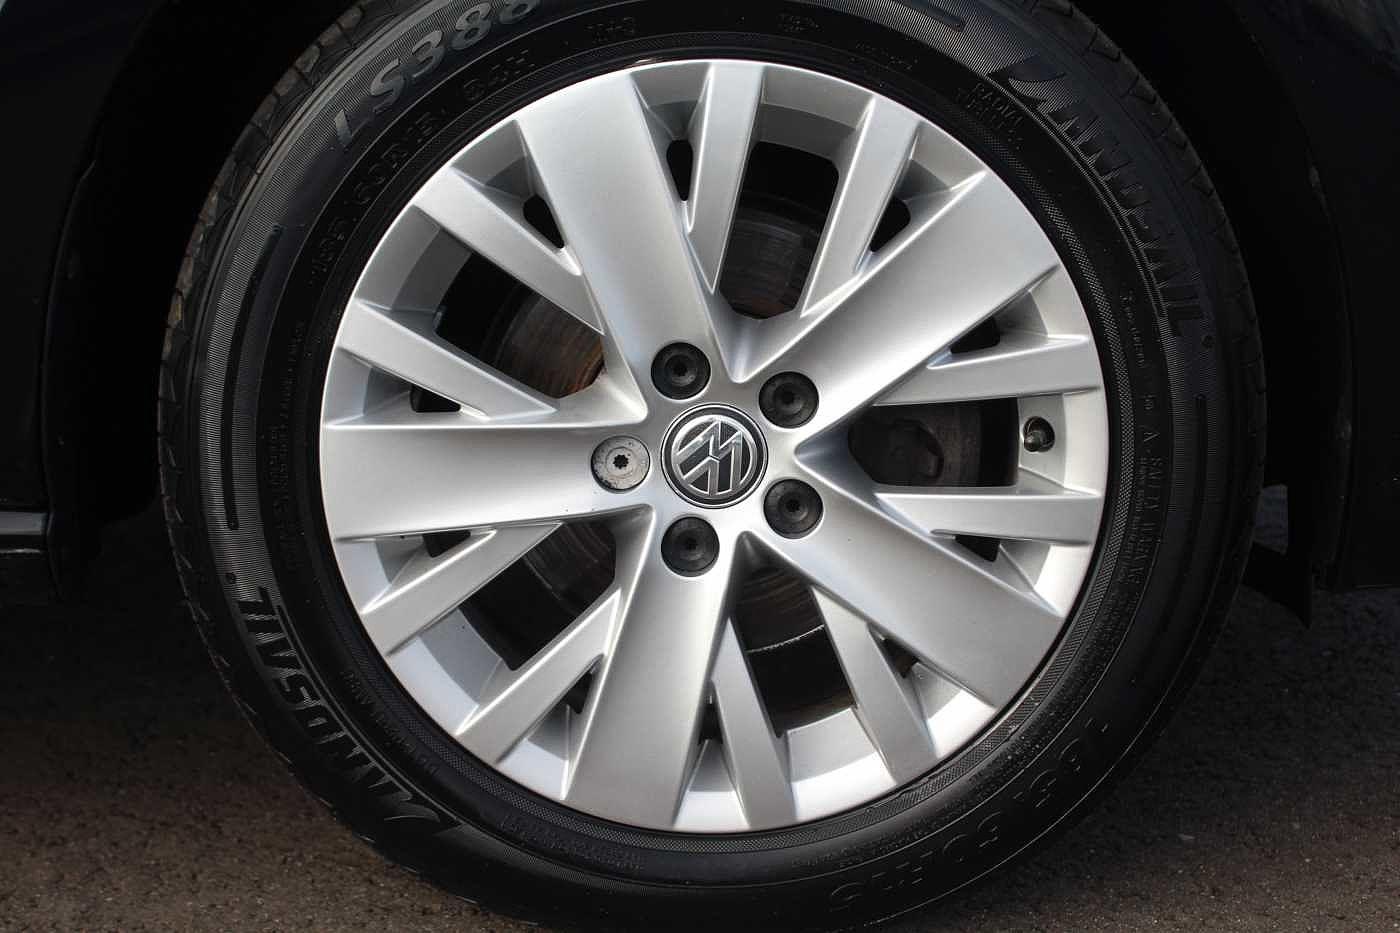 Volkswagen Polo 1.2 TSI SE (90 PS) BMT DSG